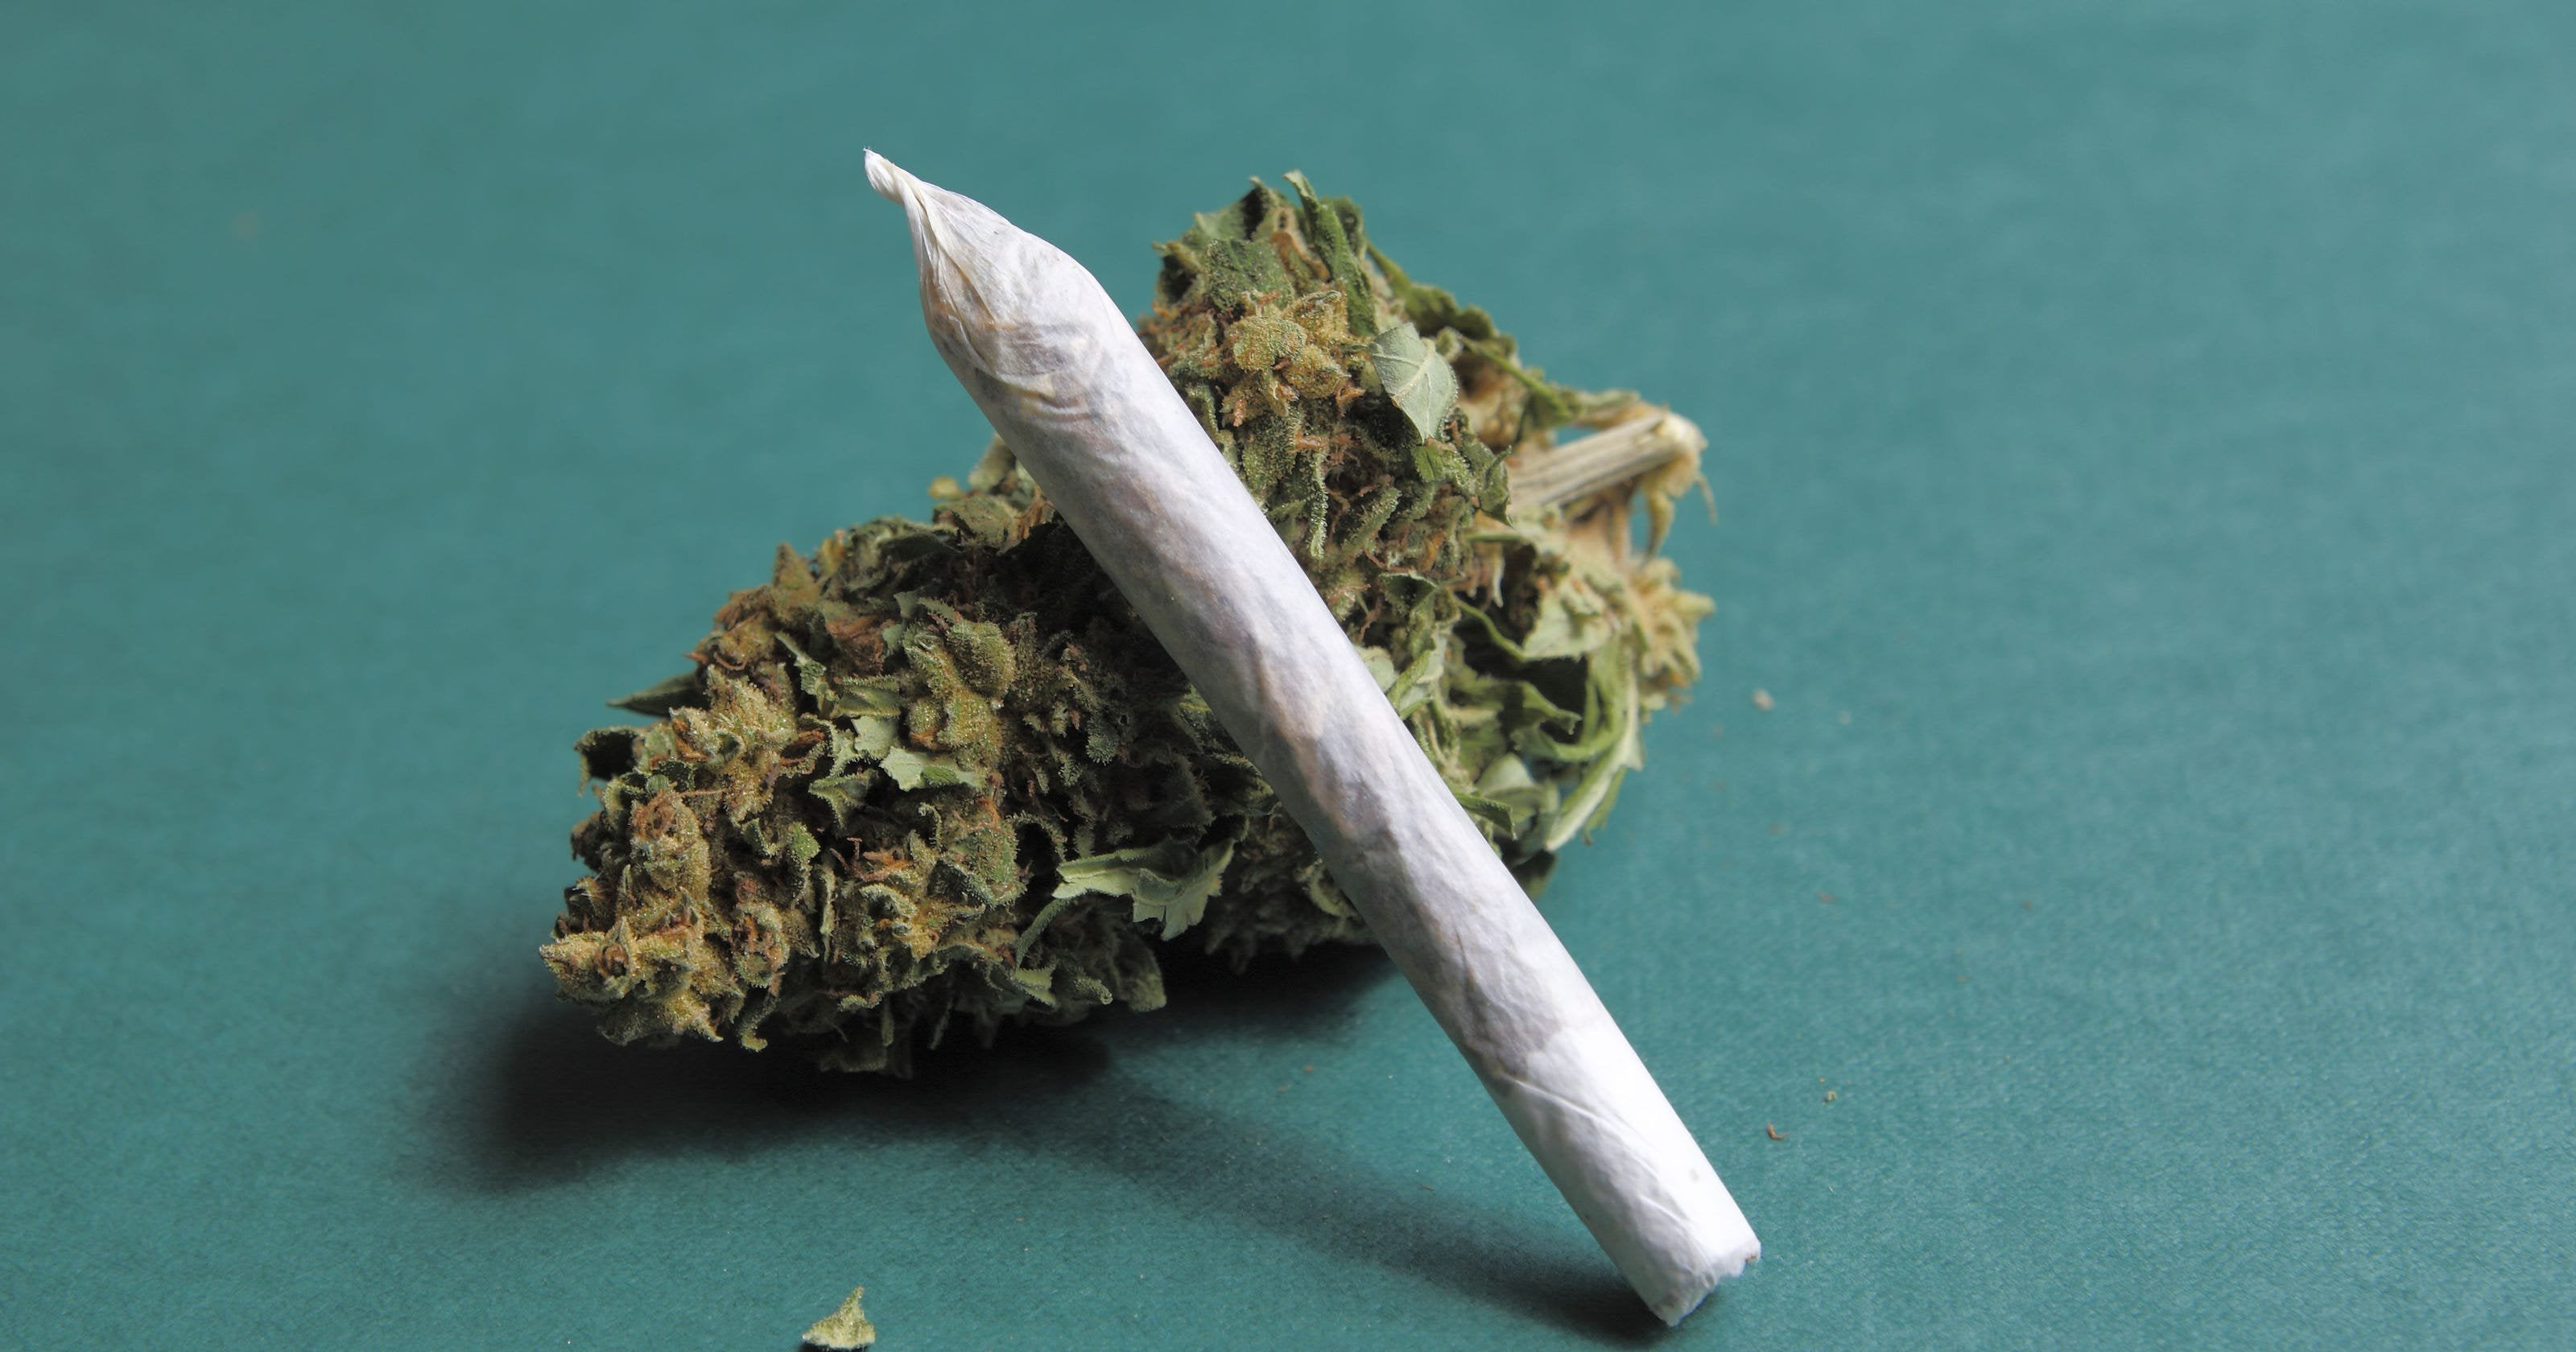 What to look for in Arizona's marijuana legalization ballot measure